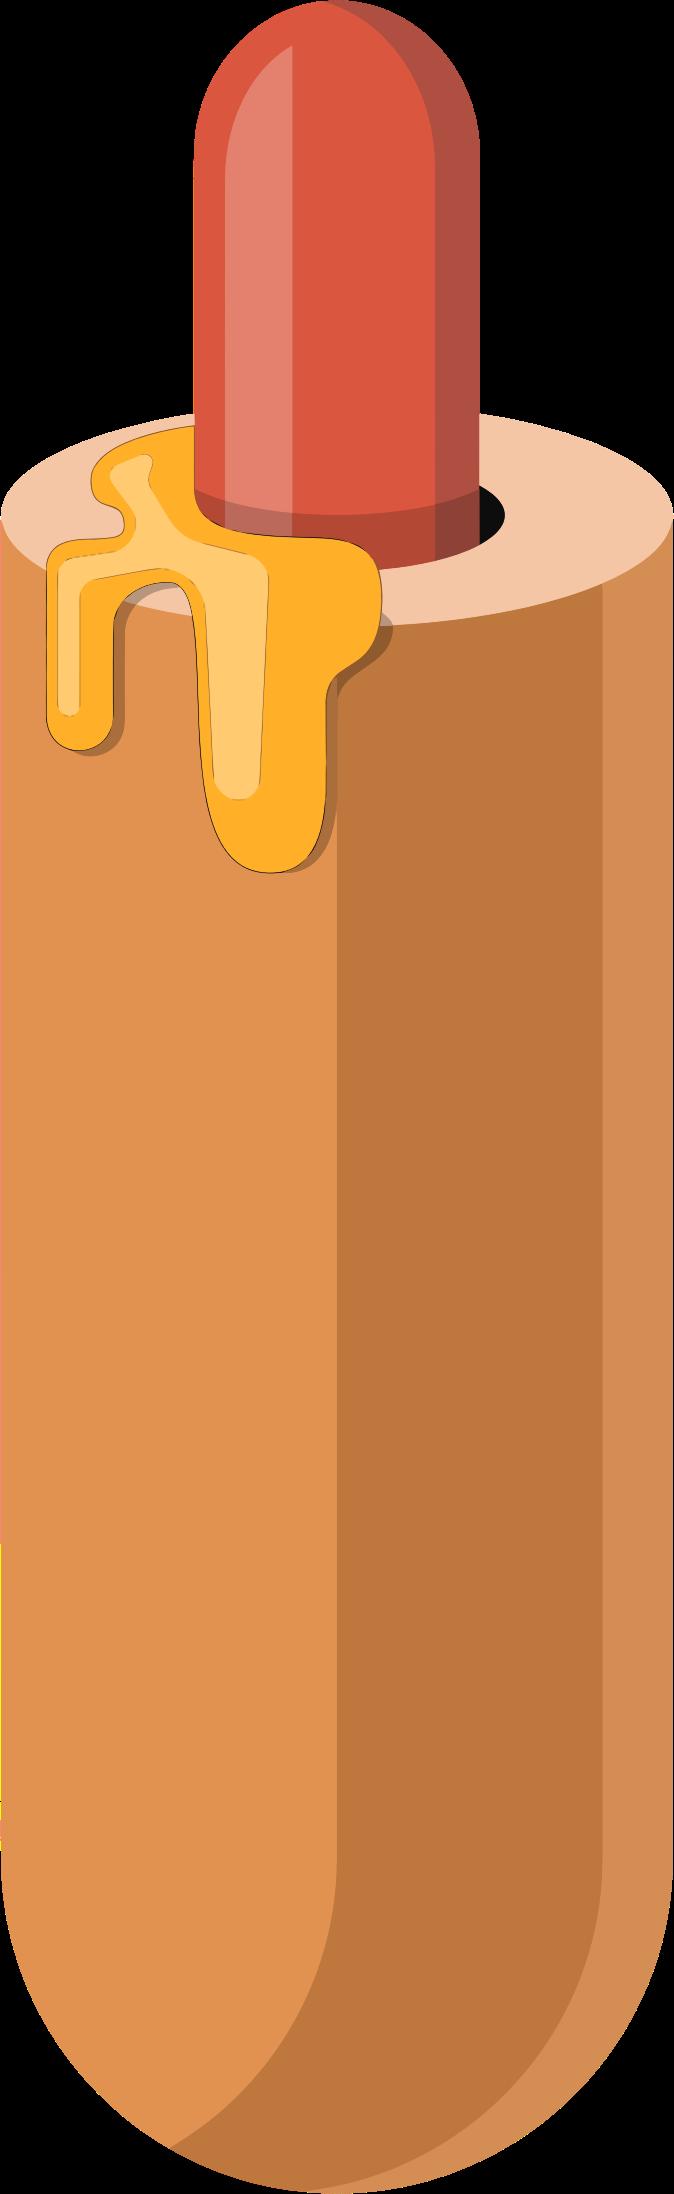 Corn dog clipart clip art transparent stock Clipart - Corndog clip art transparent stock